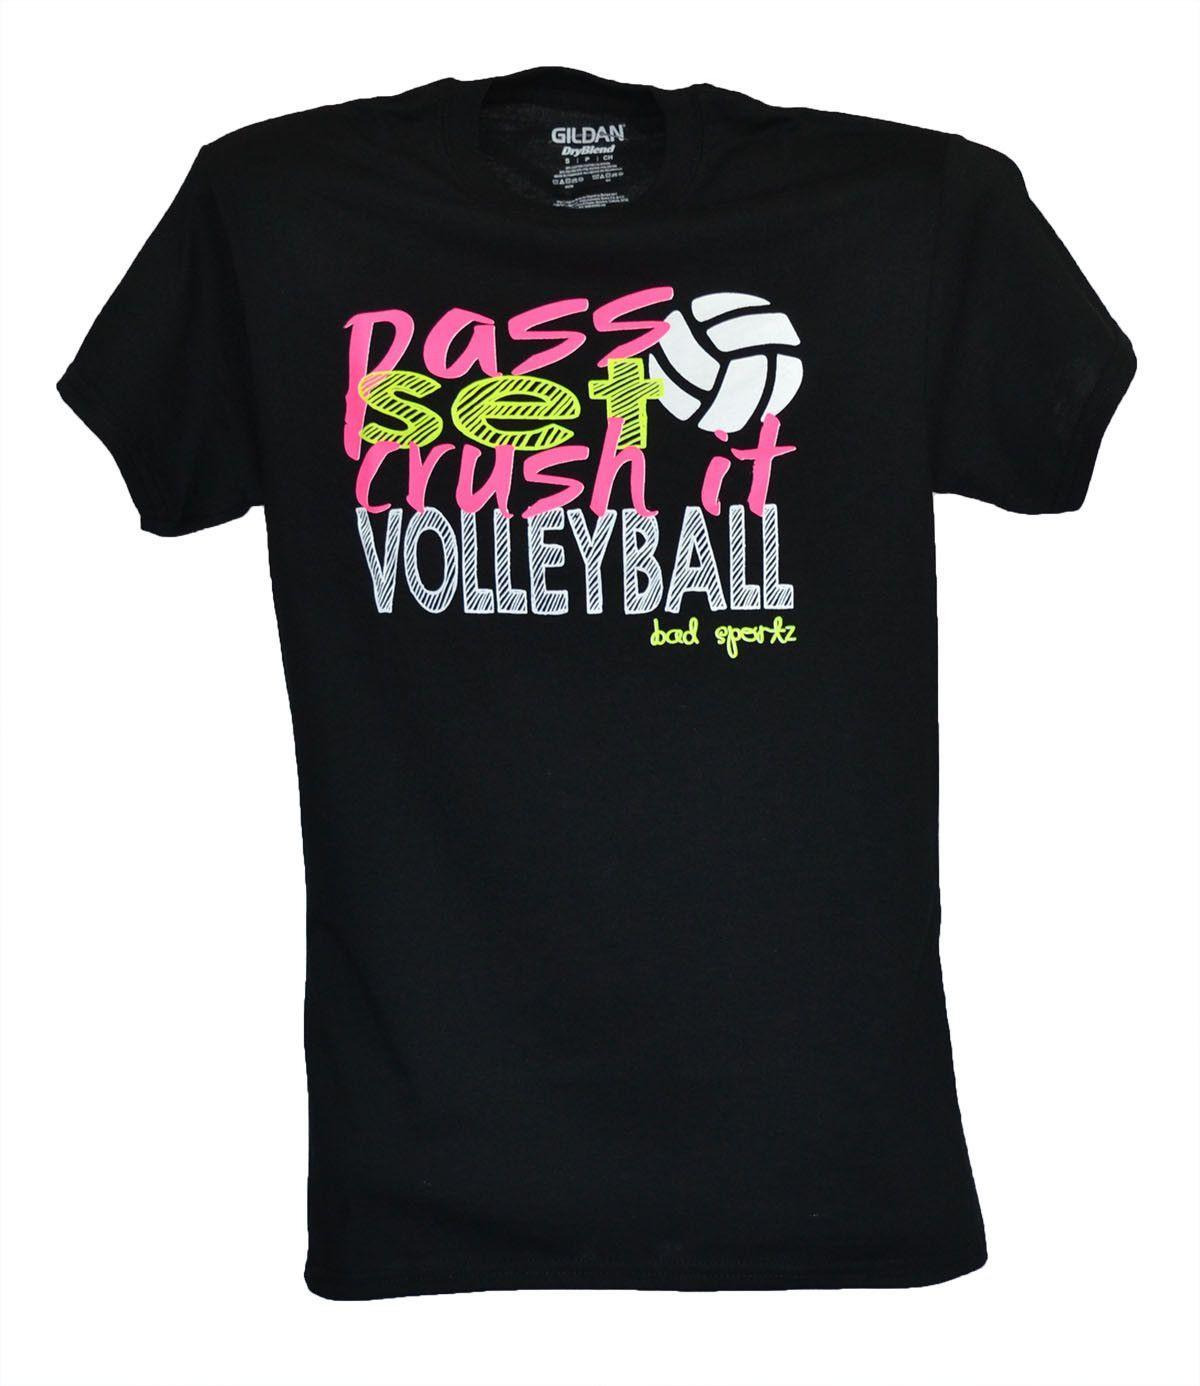 Pass Set Crush Volleyball T Shirt Volleyball Tshirts Volleyball Volleyball Shirts